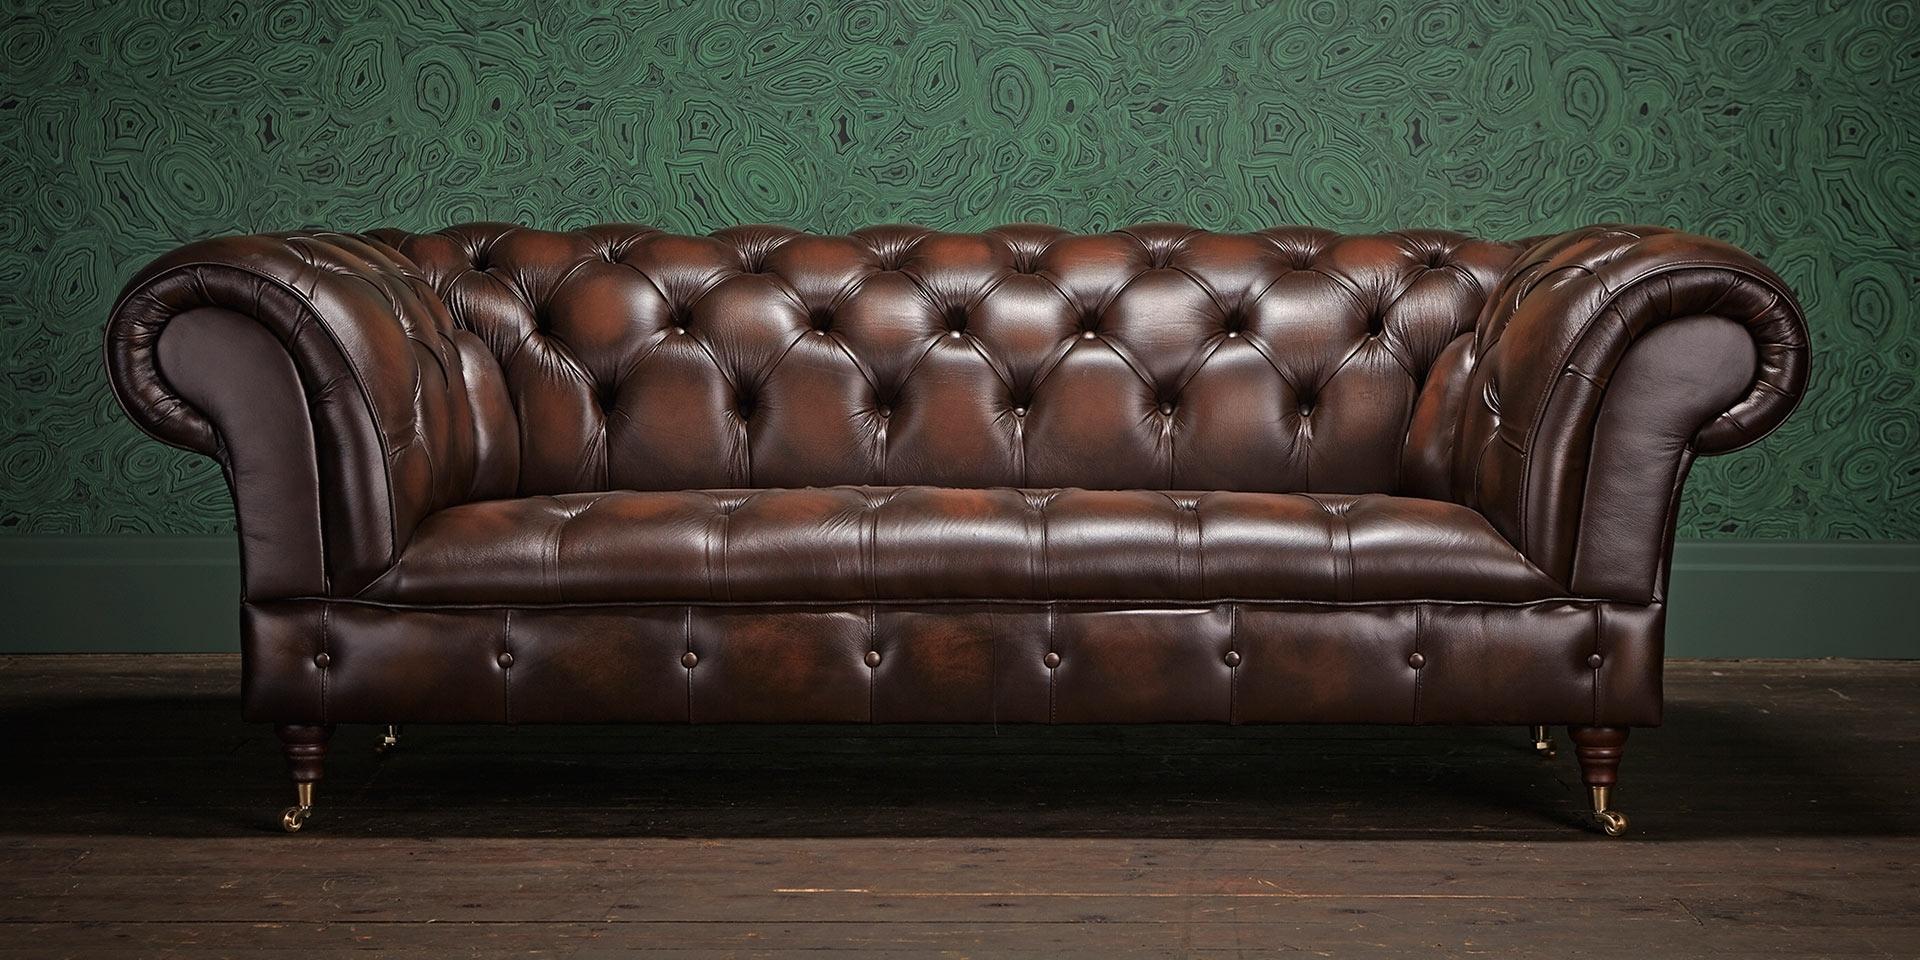 Chesterfield Sofa, Chesterfield And Chesterfield Furniture Within Chesterfield Sofas And Chairs (View 10 of 15)